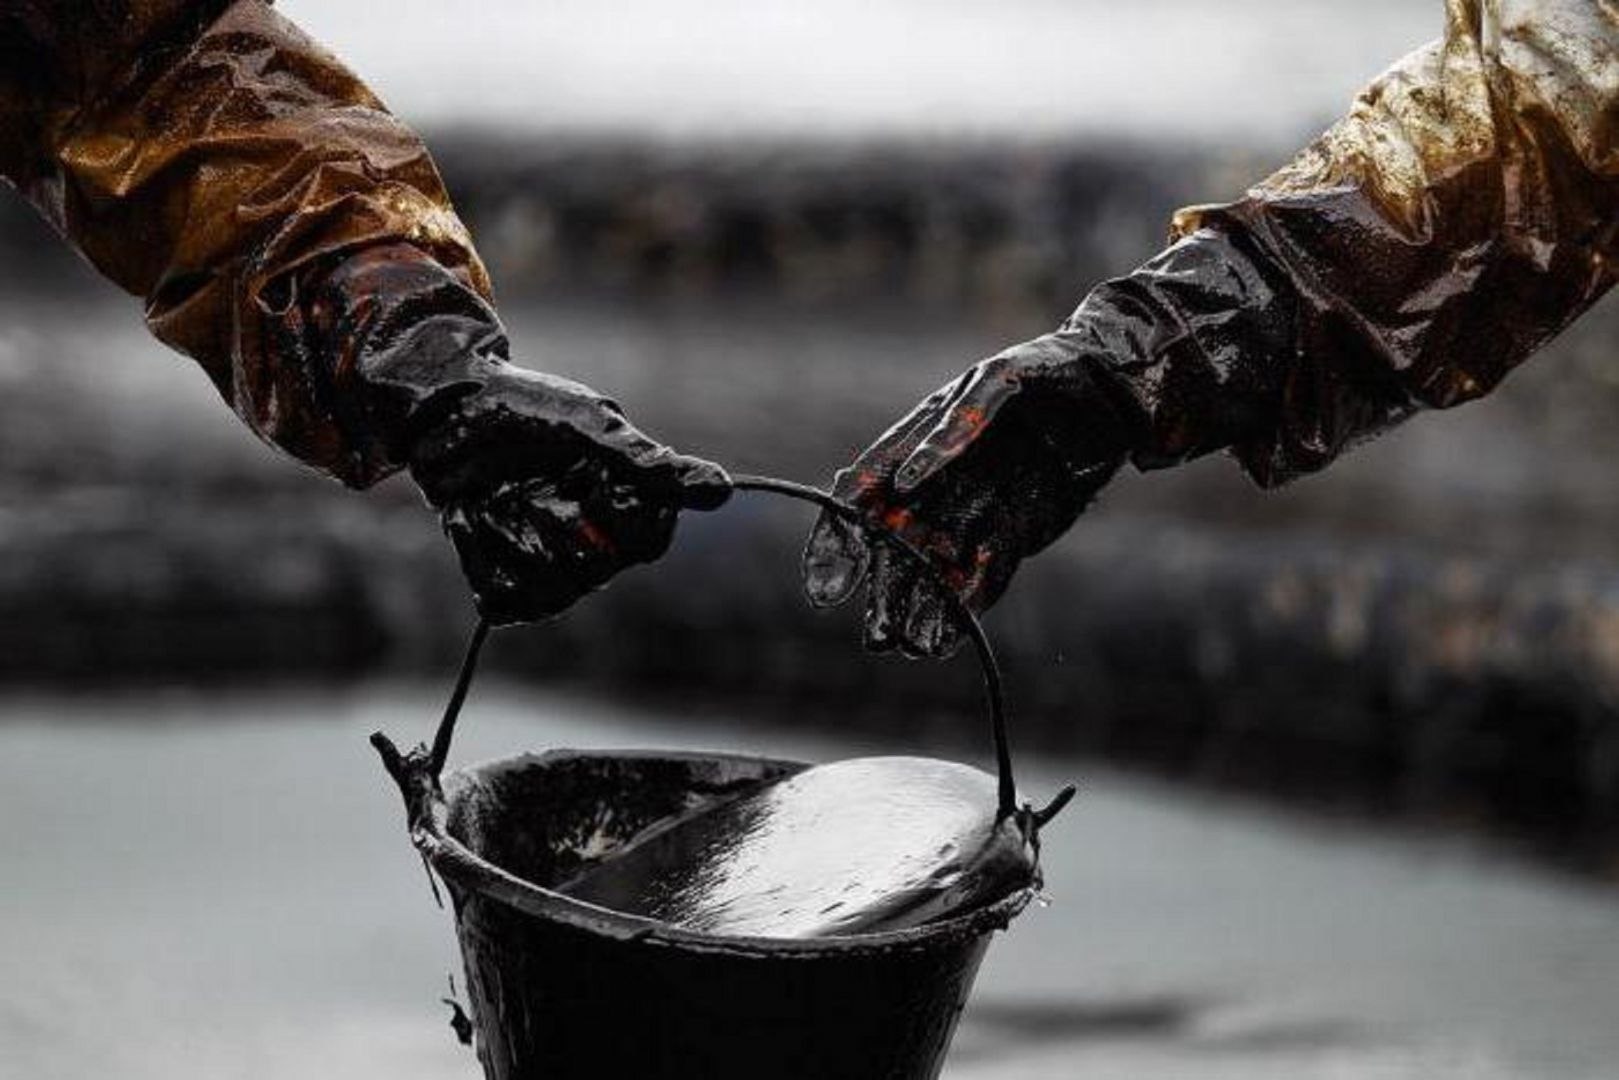 НаСтаврополье осудят троих мужчин запопытку кражи 22 тонн нефти